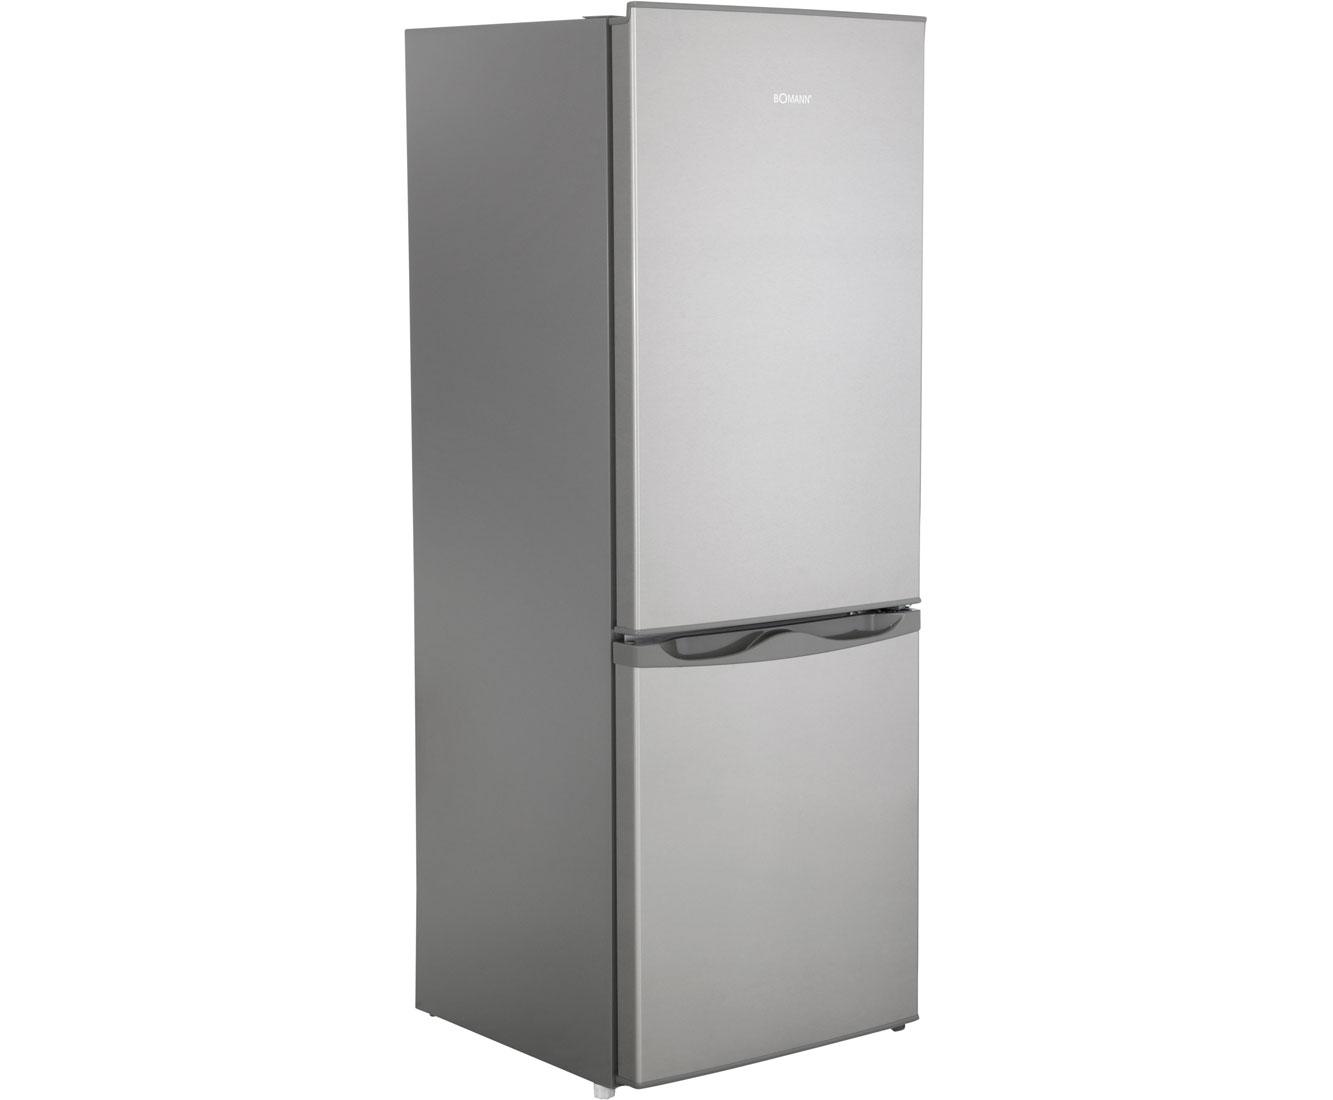 Bomann Kühlschrank Unterbaufähig : Bomann kg 322 kühl gefrierkombination edelstahl optik a